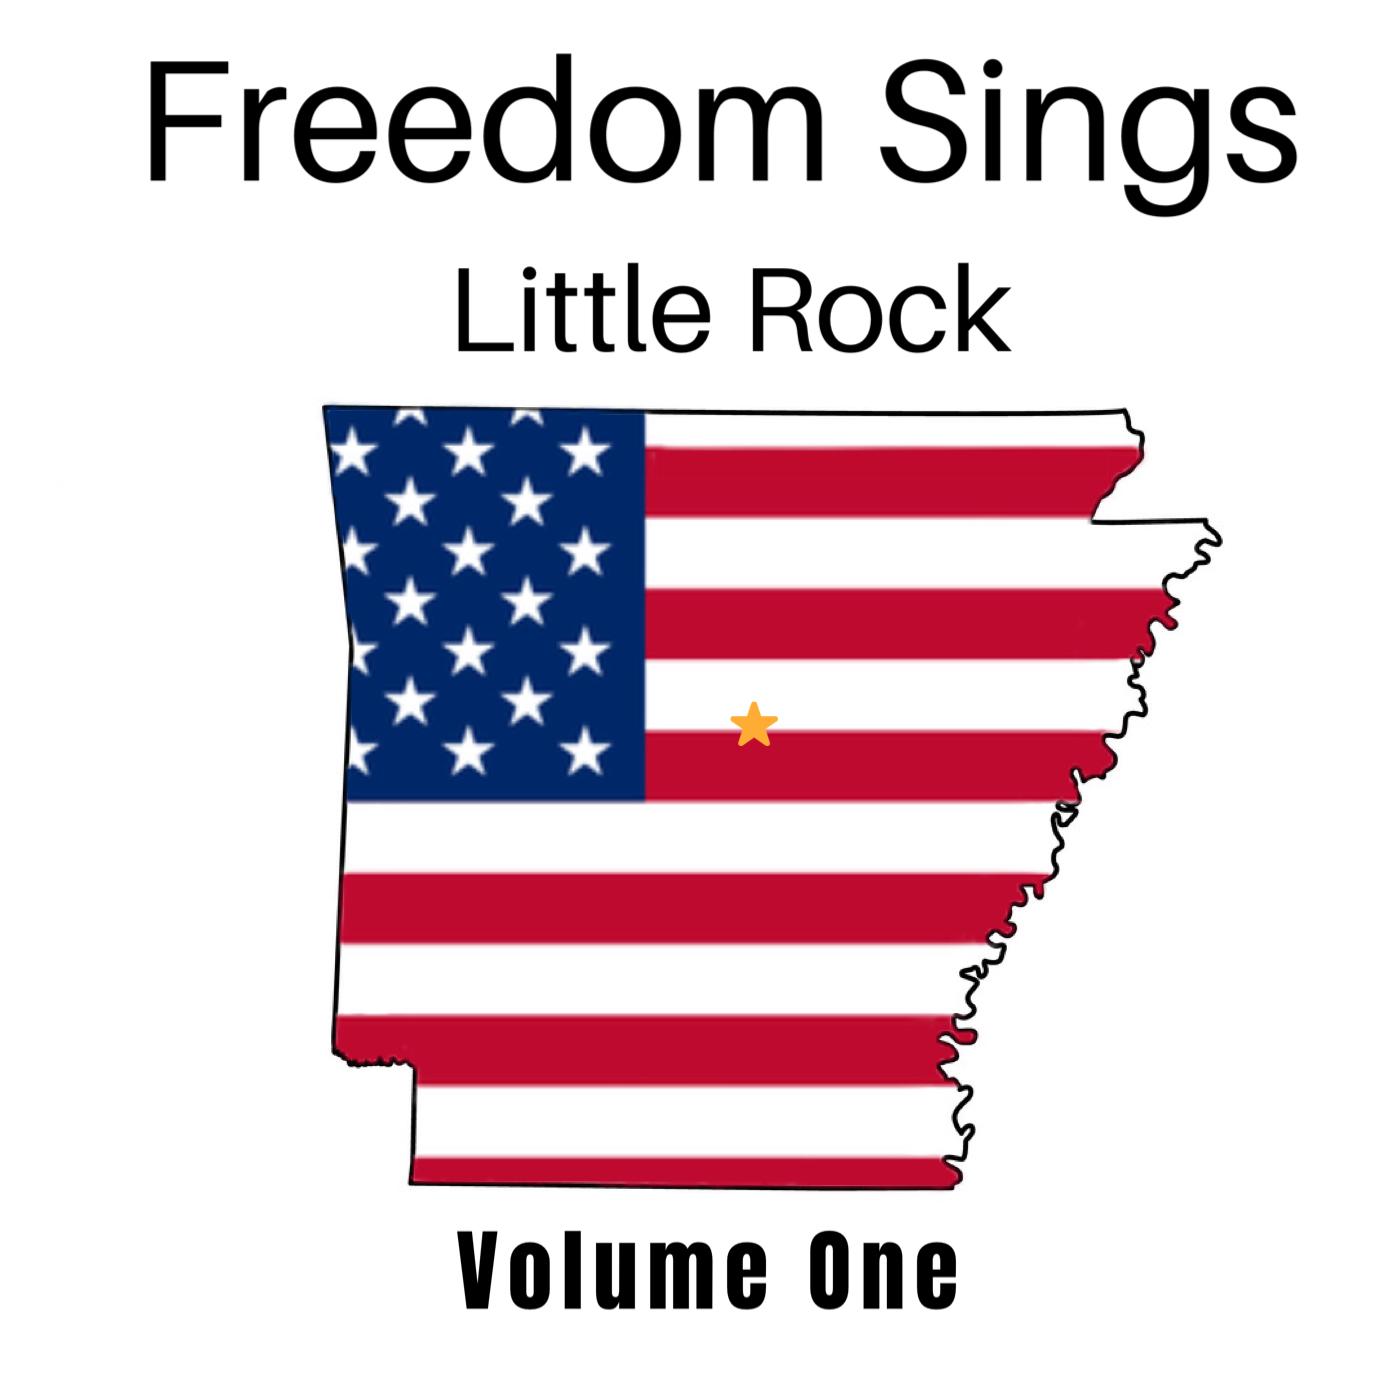 Freedom Sings USA Little Rock Volume I